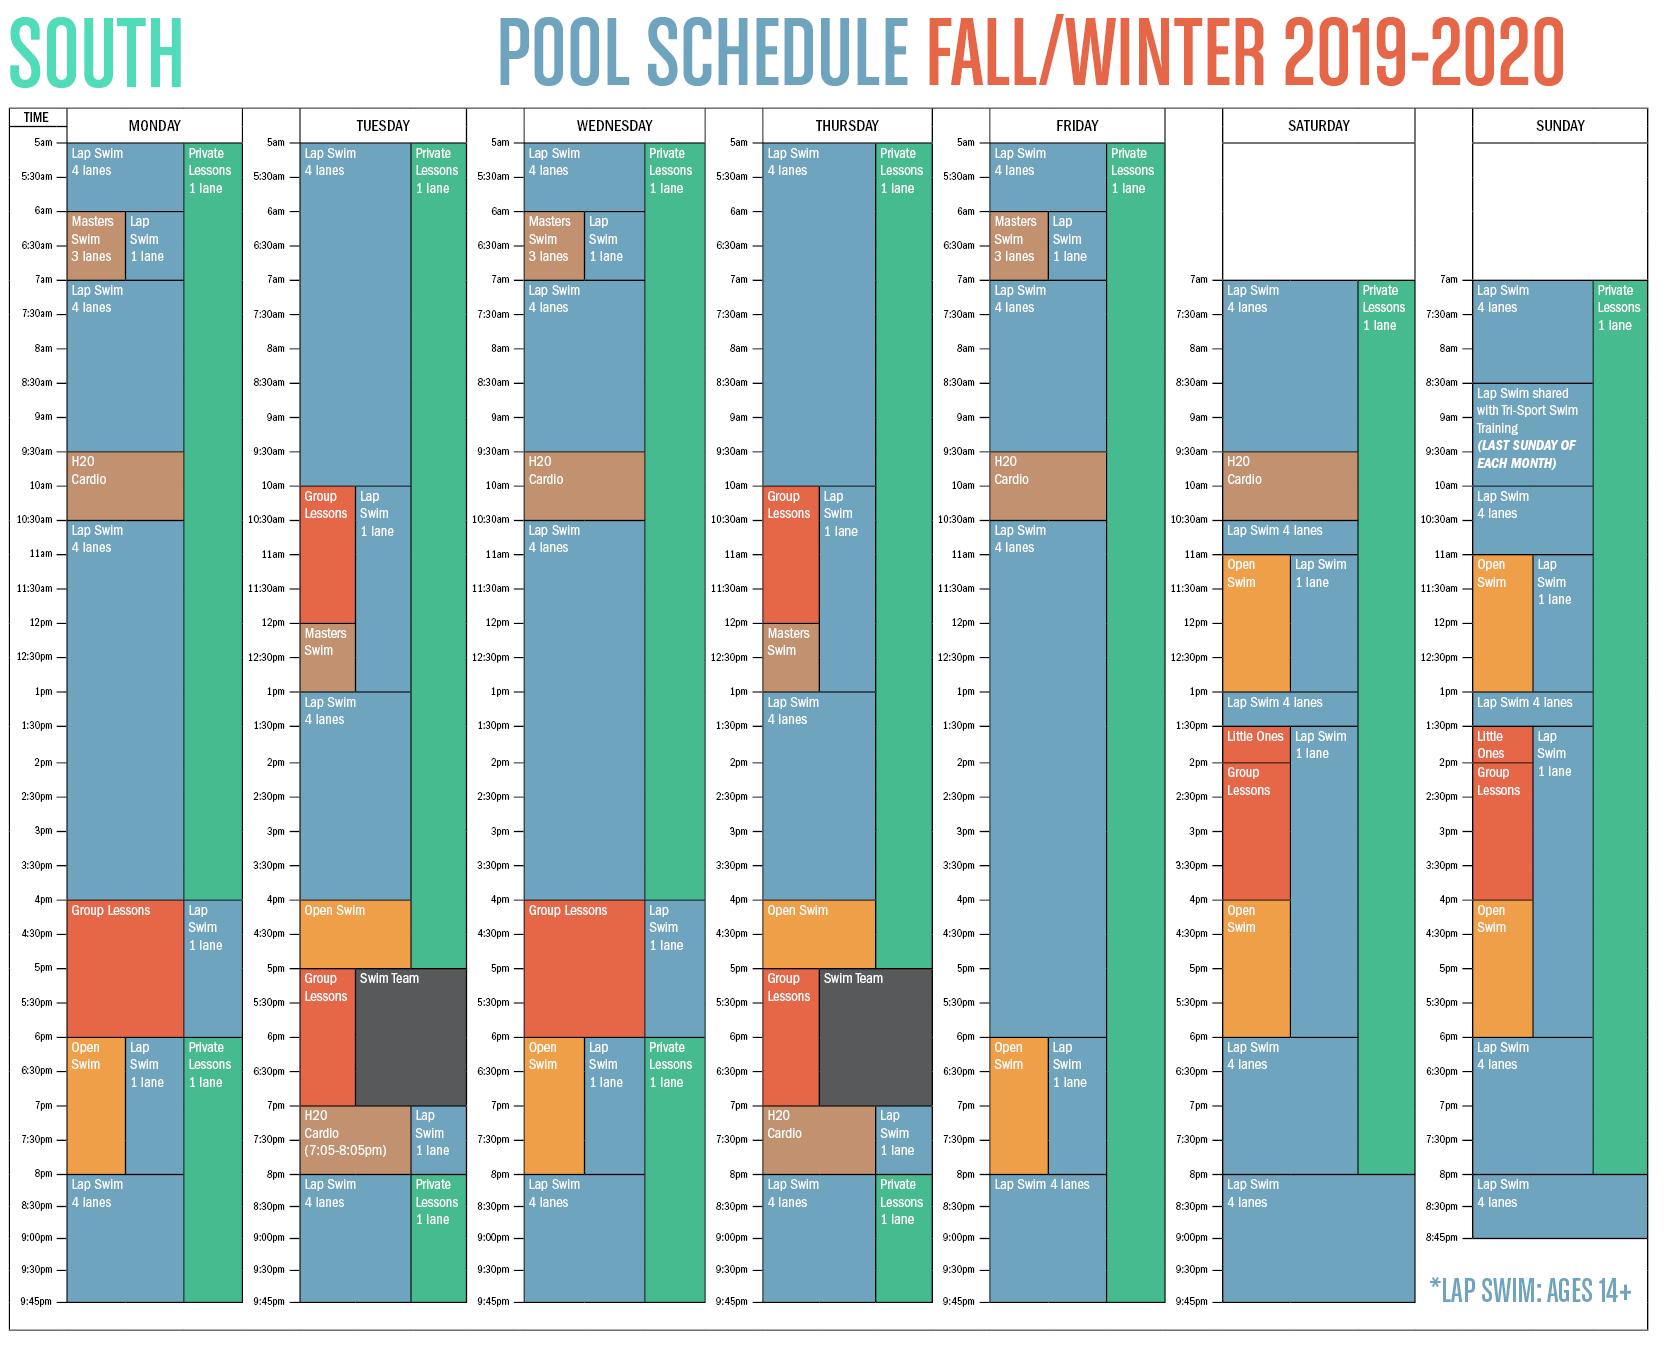 Q4-Q1 Fall-Winter South Pool Schedule [WEB]